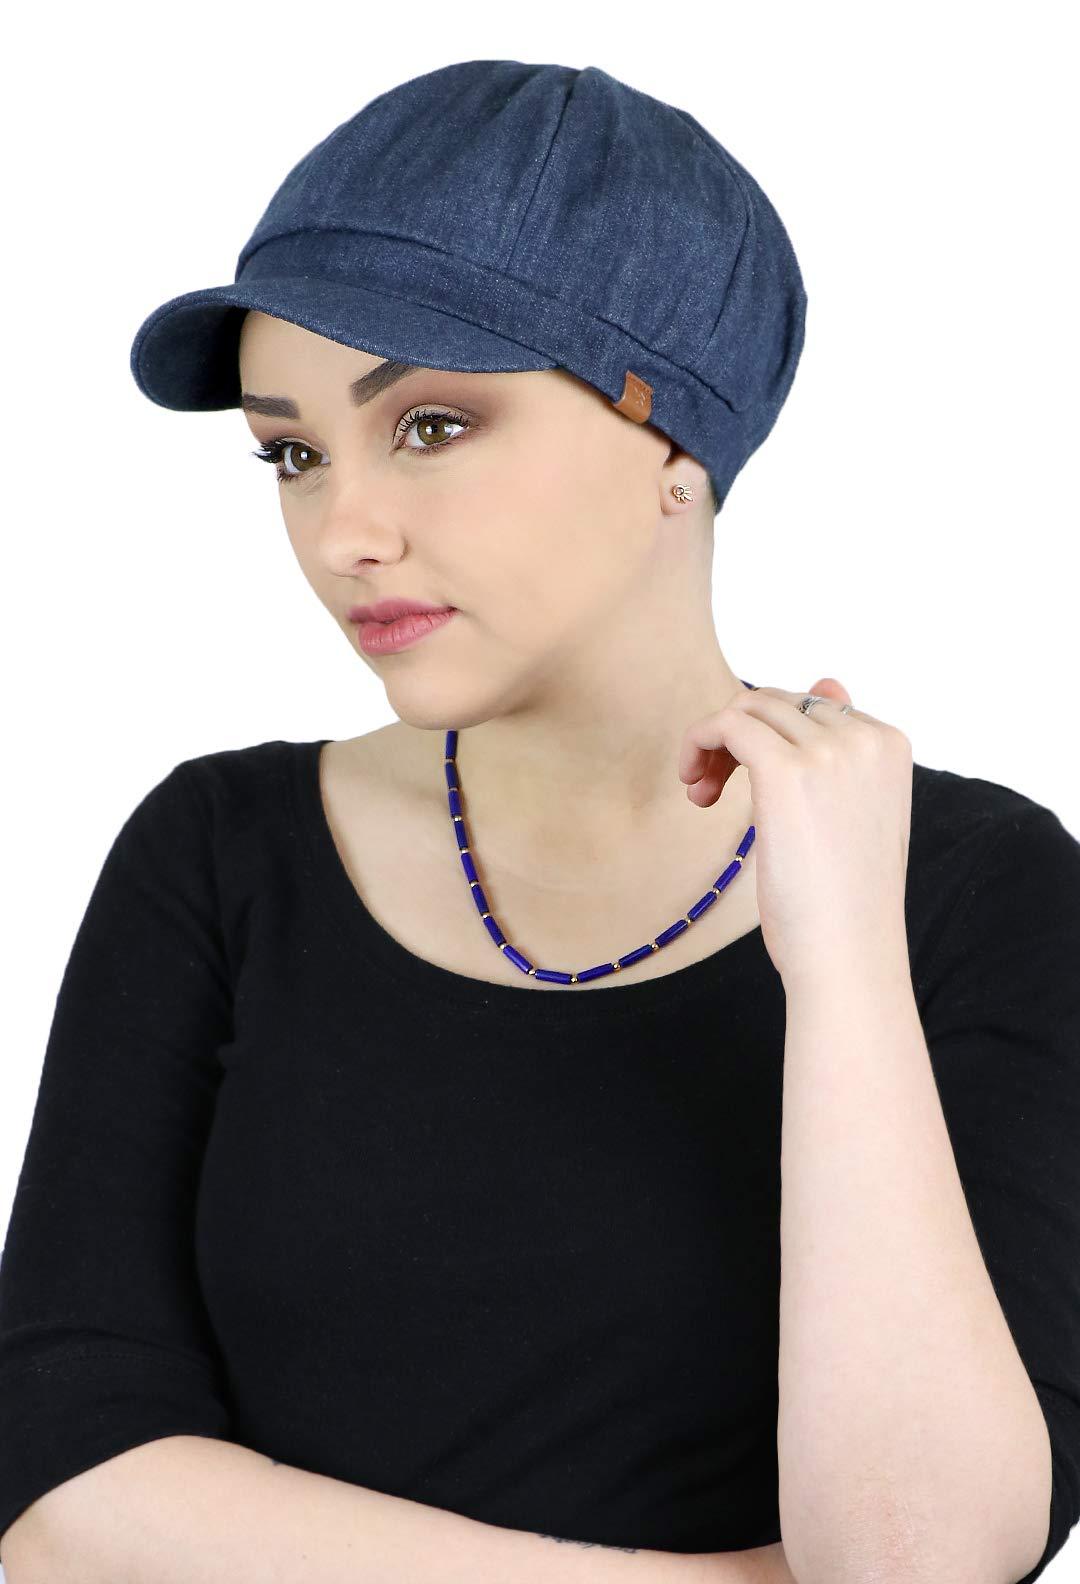 Newsboy Cap for Women Cabbie Gatsby Summer Hats Ladies Chemo Headwear Head Coverings Denim (Indigo) by Hats Scarves & More